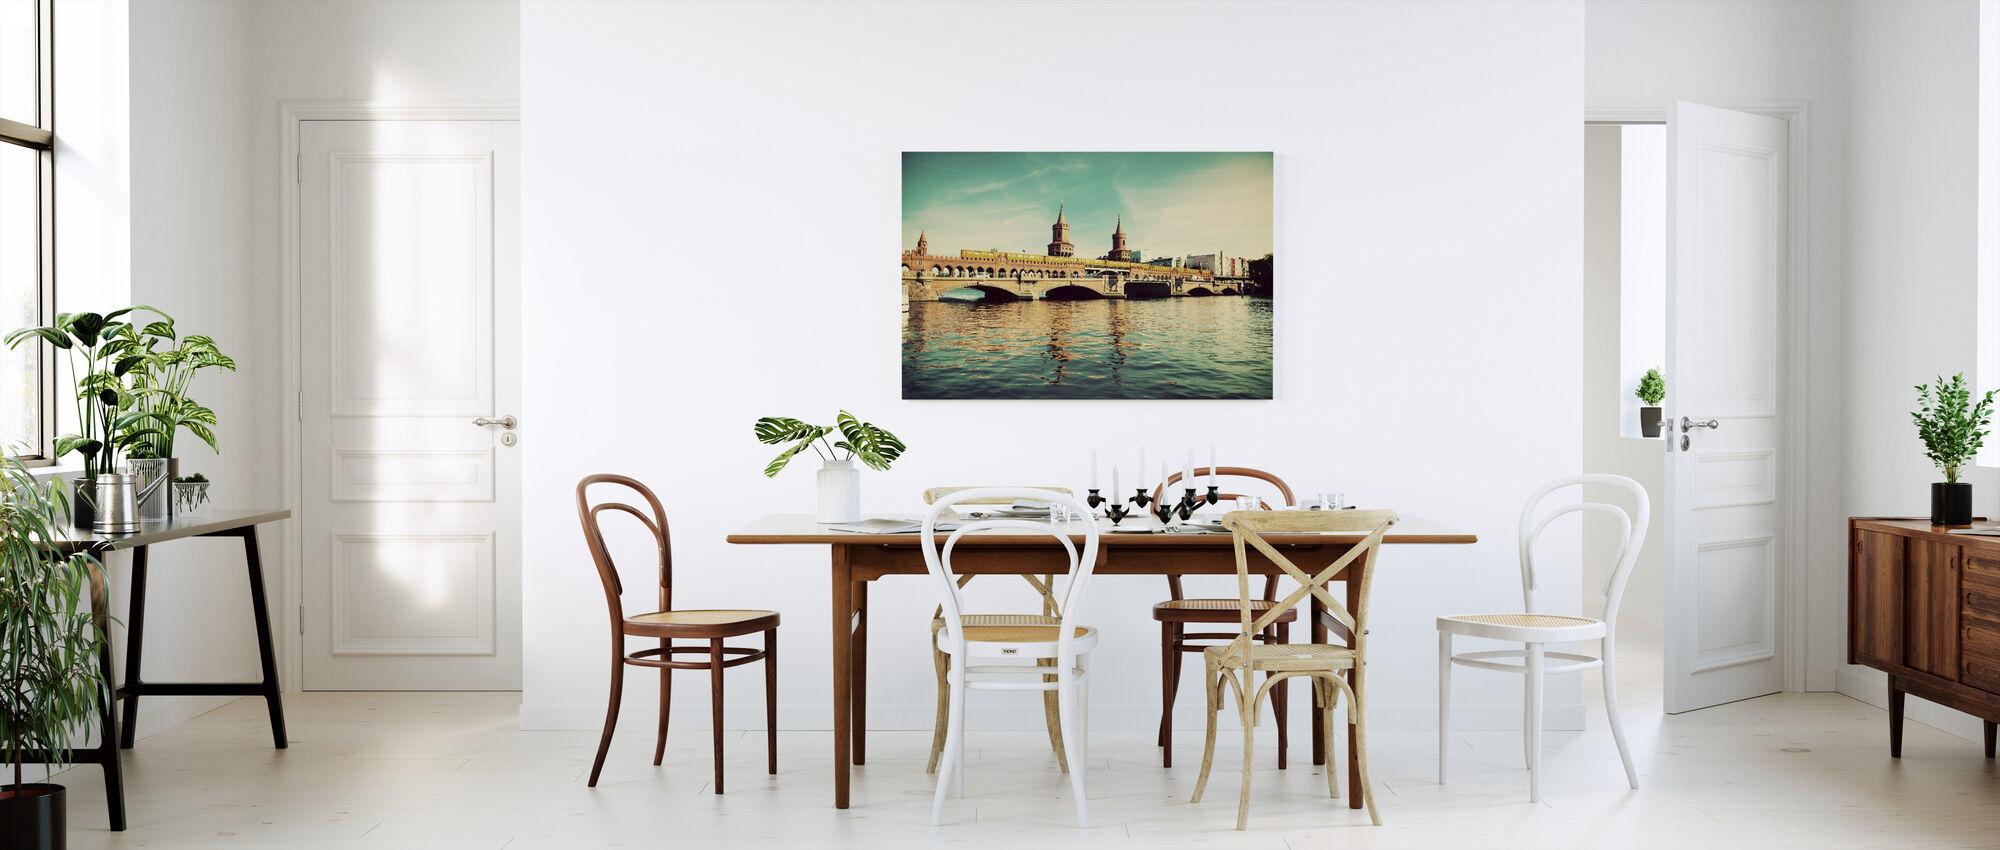 The Oberbaum Bridge and River Spree in Berlin - Canvas print - Kitchen